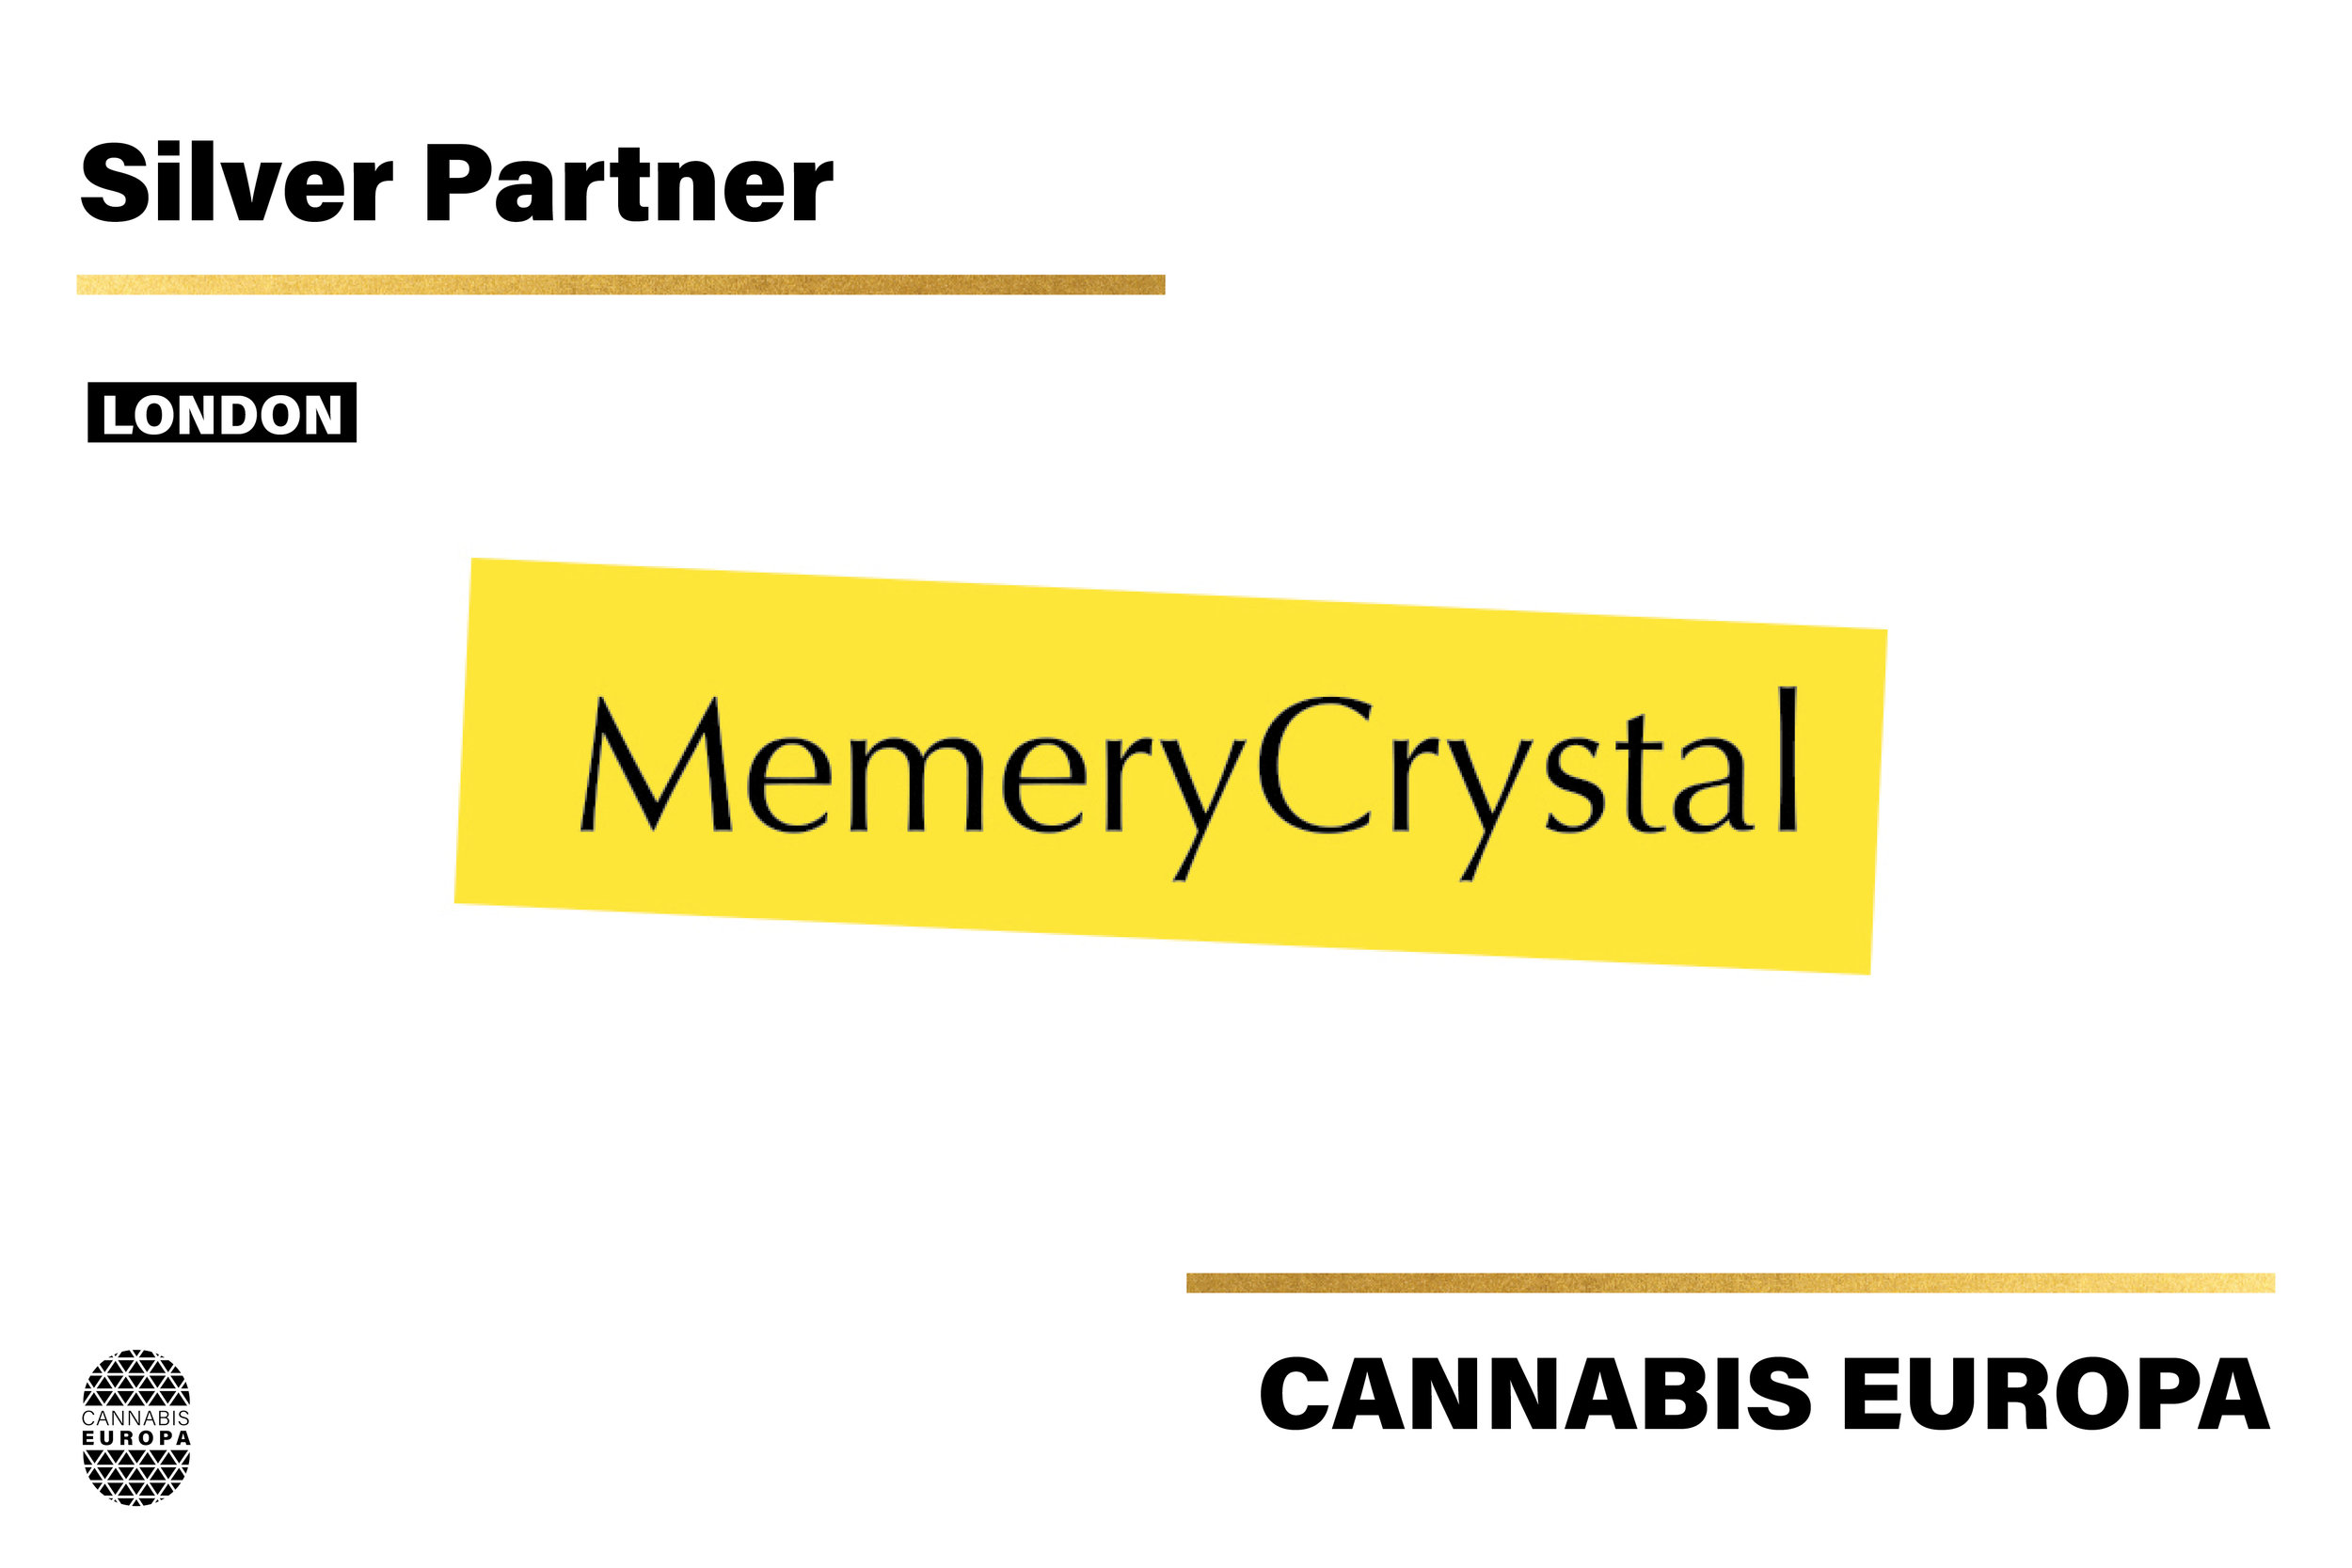 Partner Announcement Memery Crystal - LinkedIn.jpg